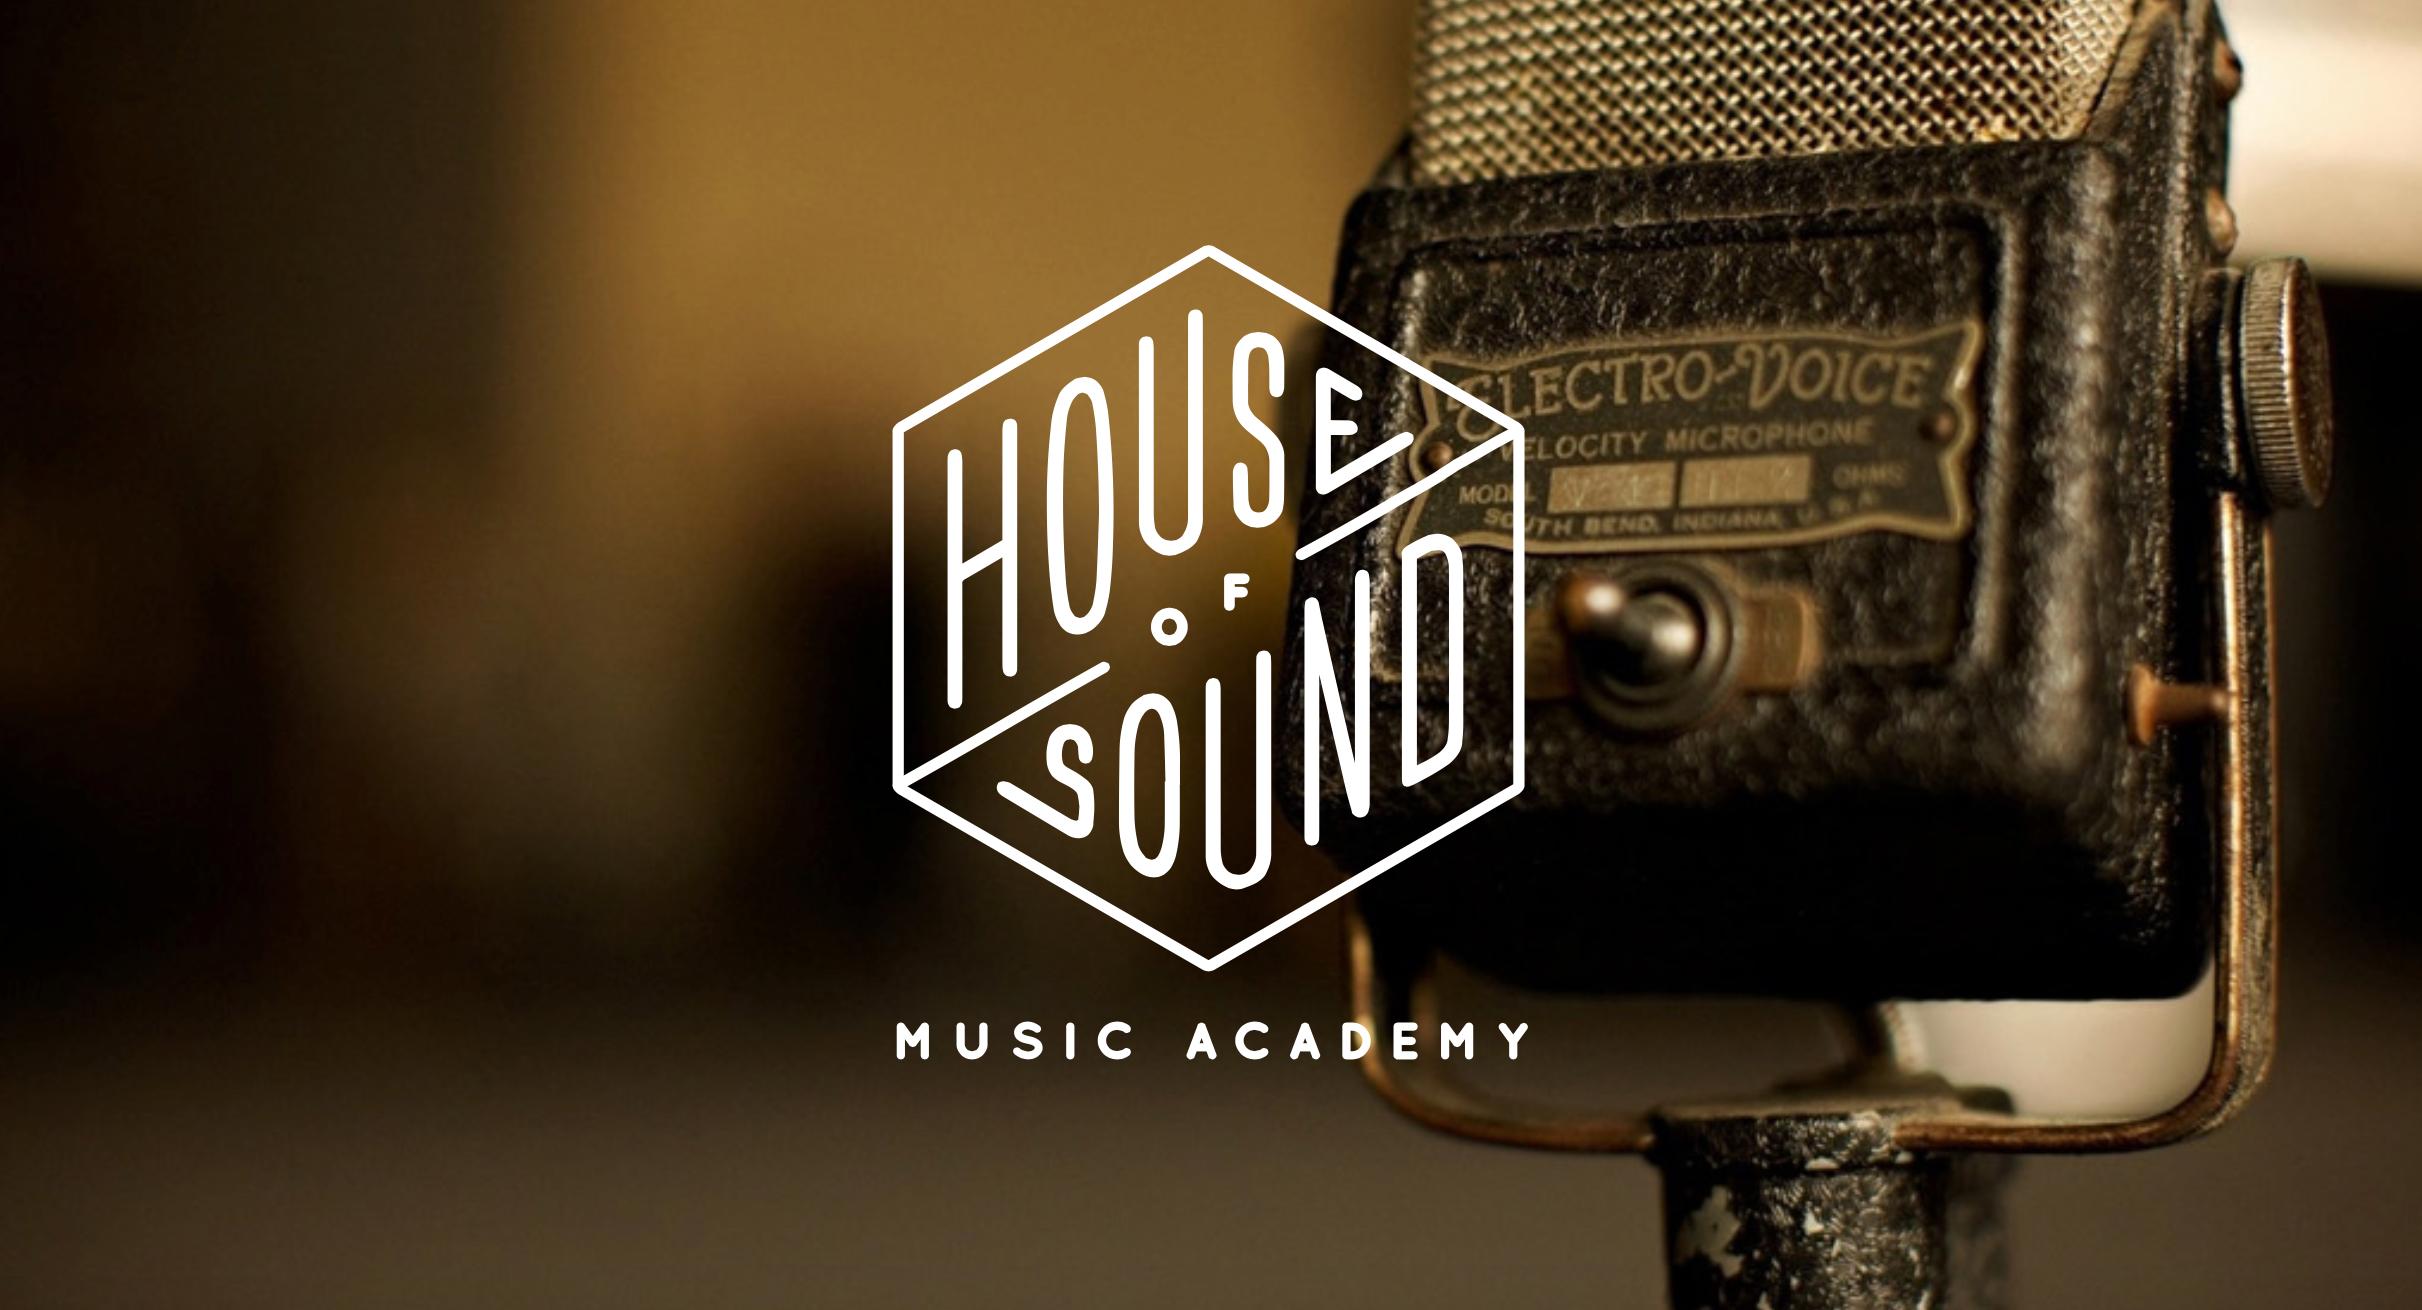 Houseofsoundmic.jpg